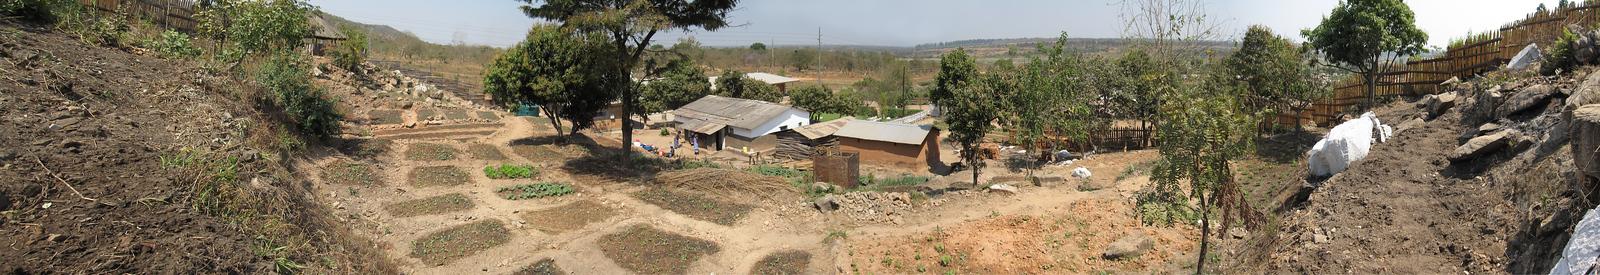 2009-08 Kantolomba Panoramas